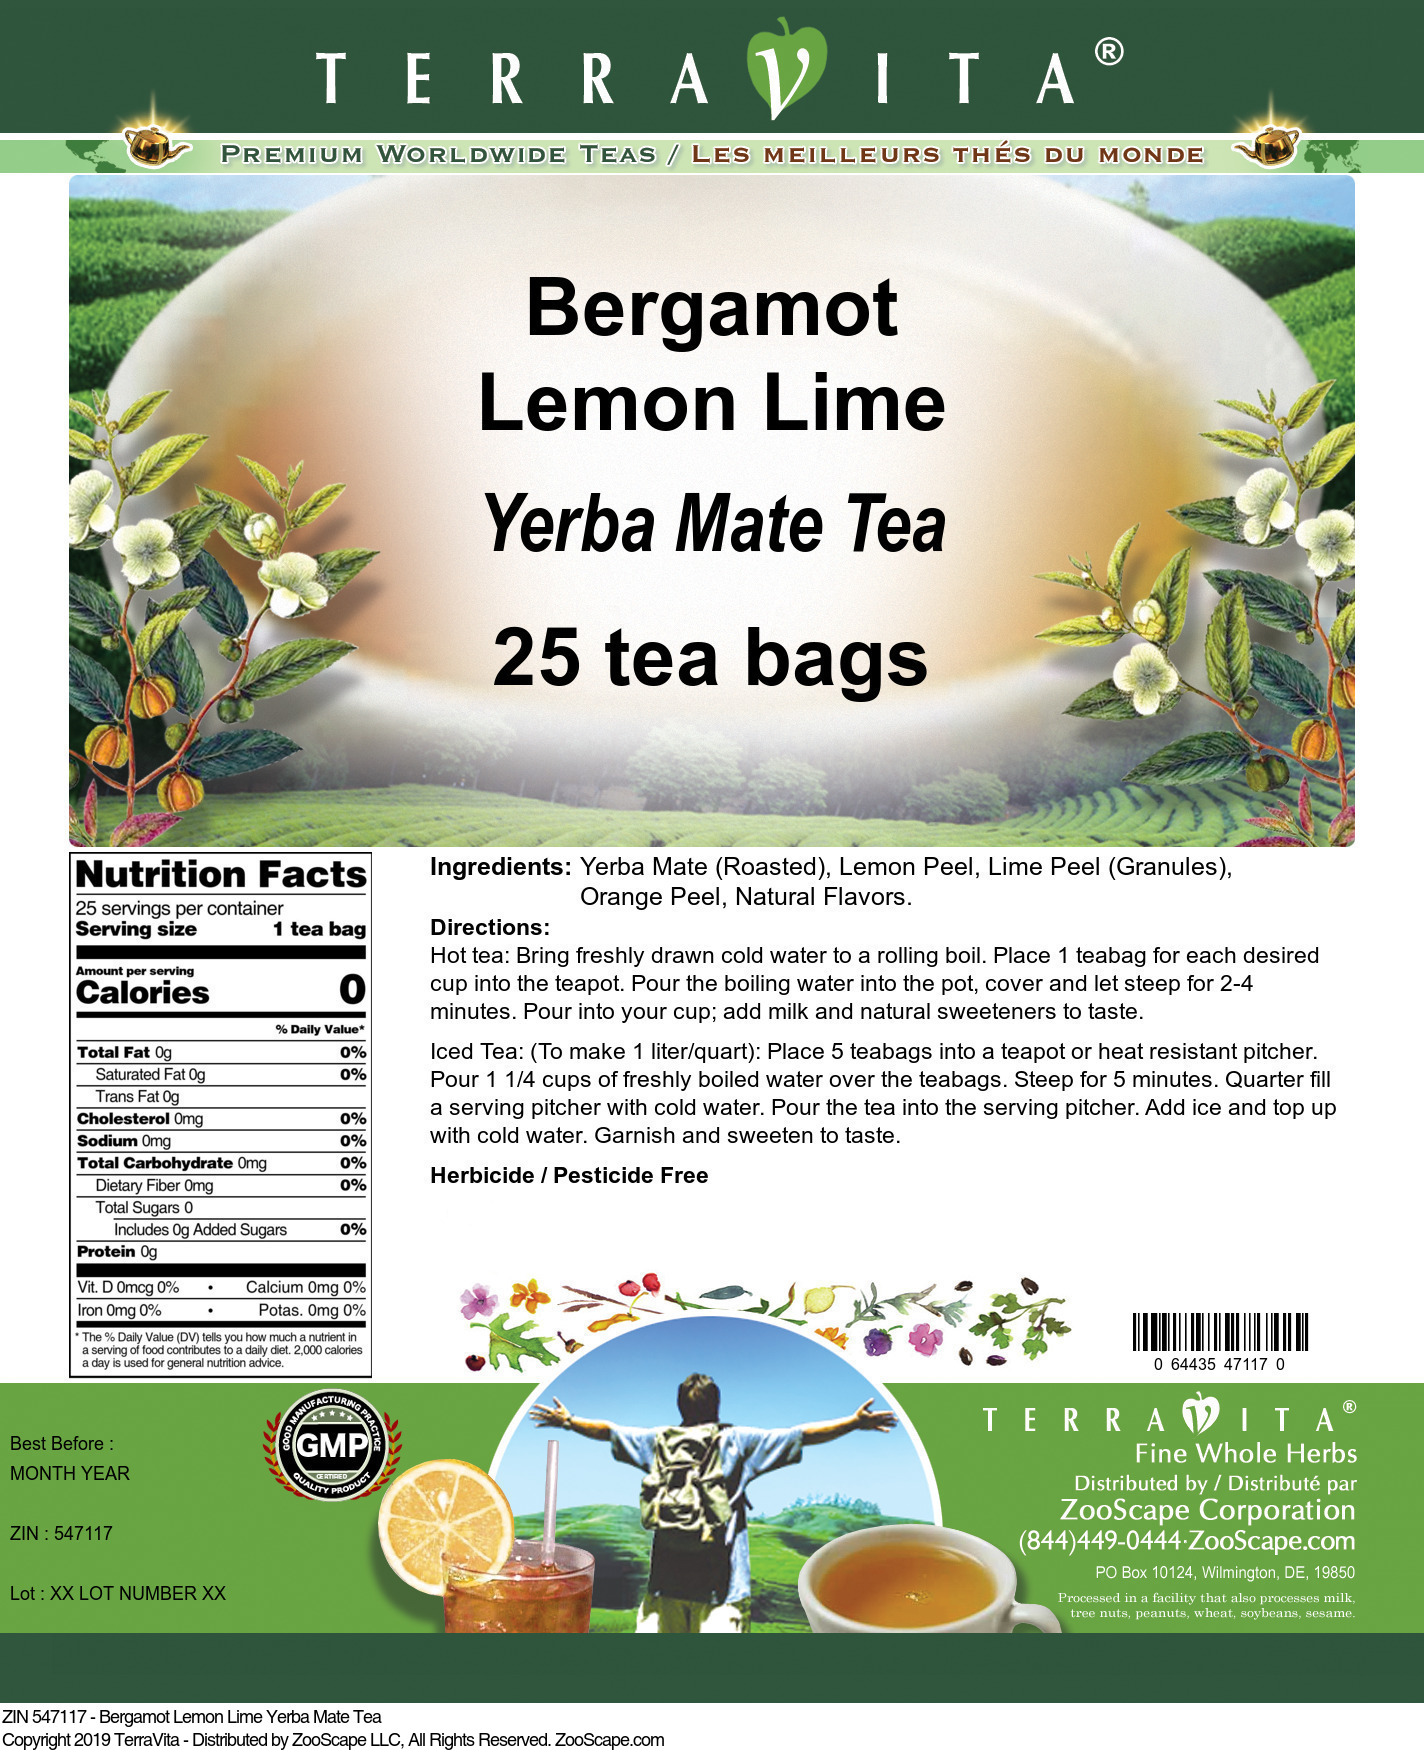 Bergamot Lemon Lime Yerba Mate